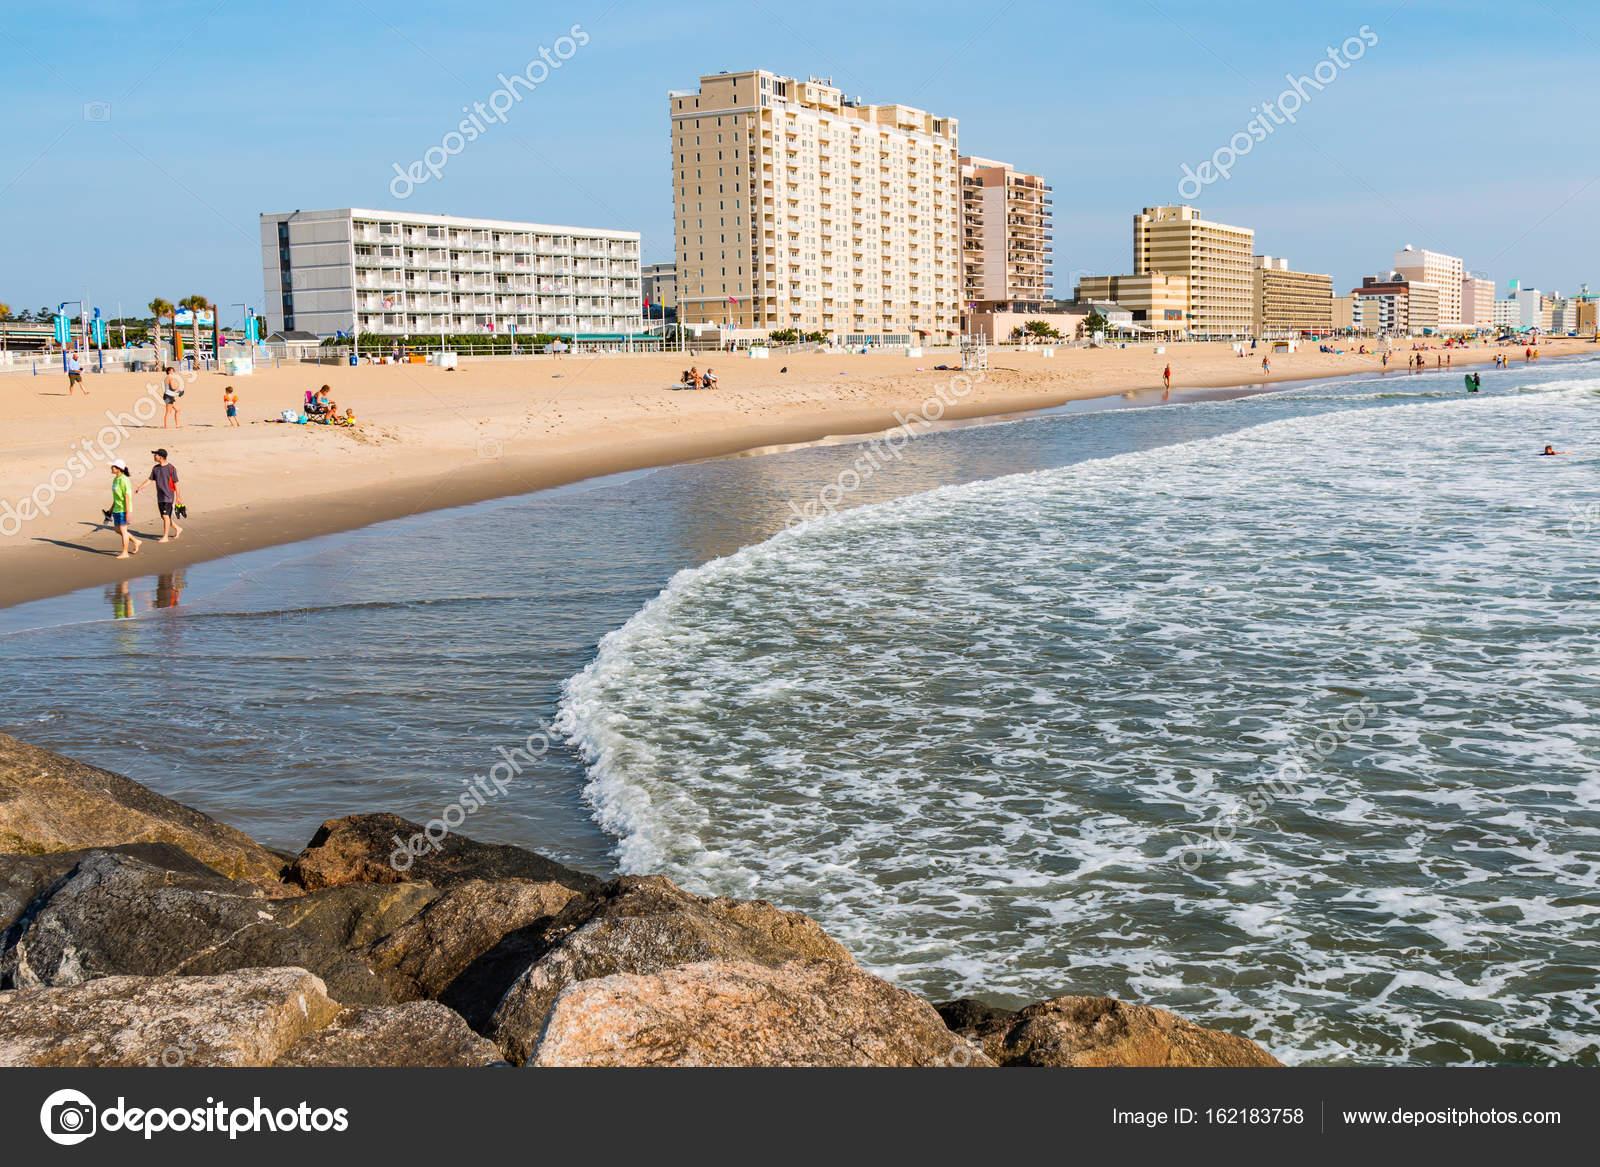 Pictures: virginia beach boardwalk | View of Virginia Beach